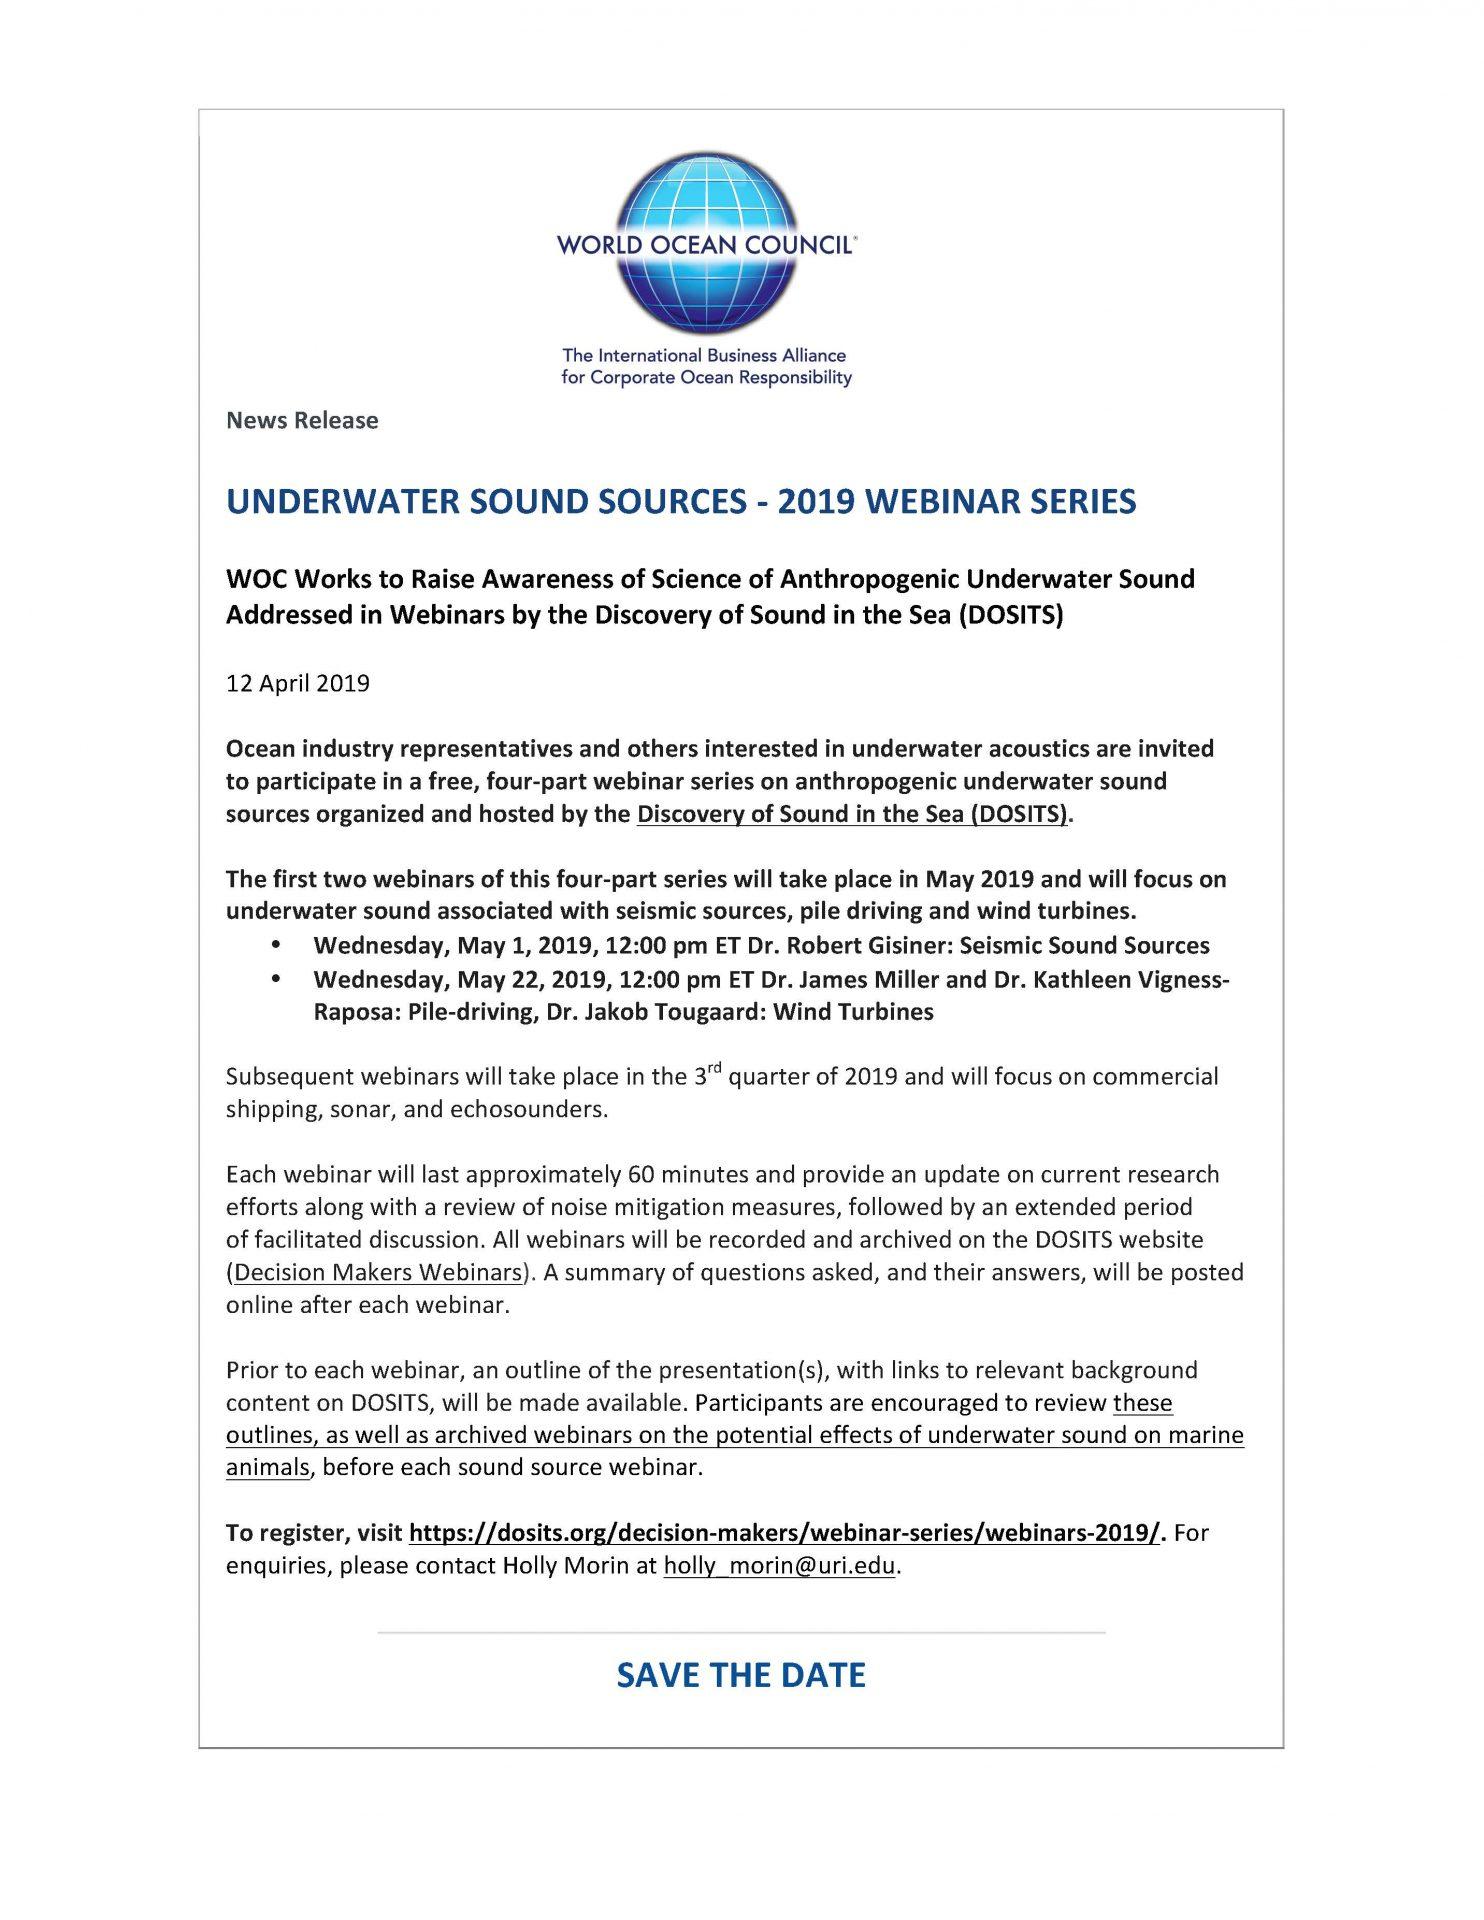 Underwater Sound Sources - 2019 Webinar Series - 12 April 2019